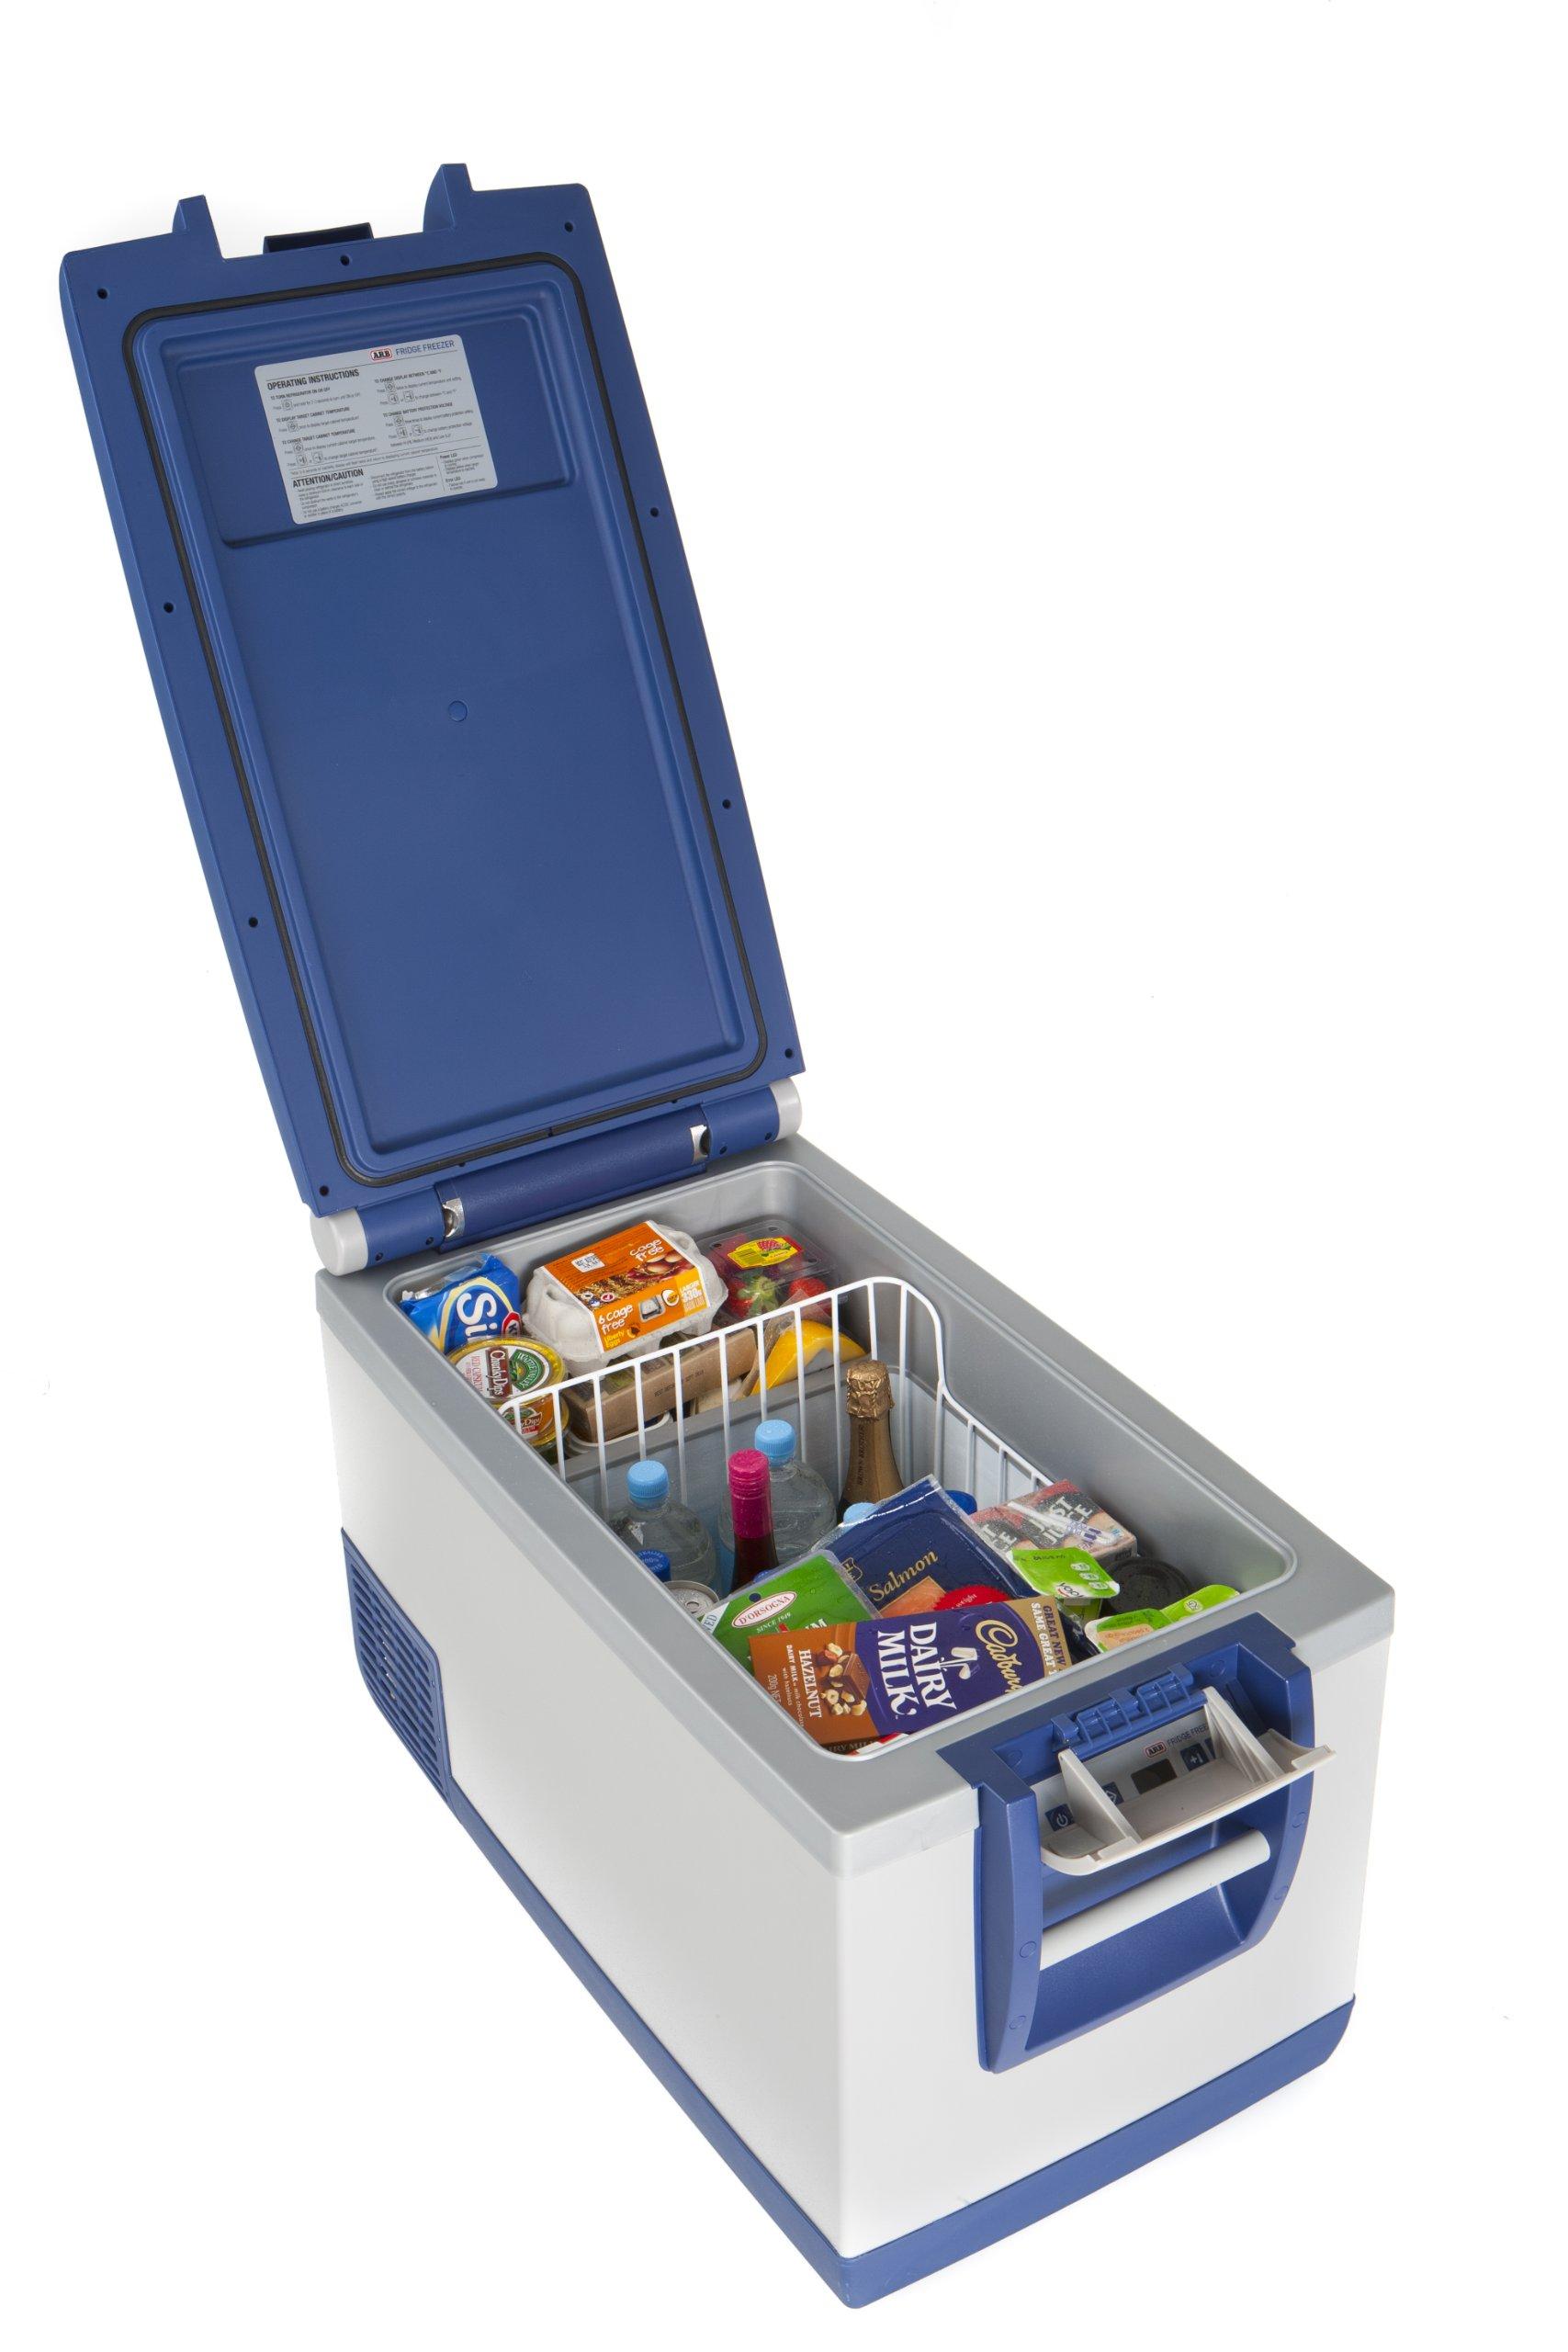 ARB 10800782 Fridge Freezer - 82 Quart